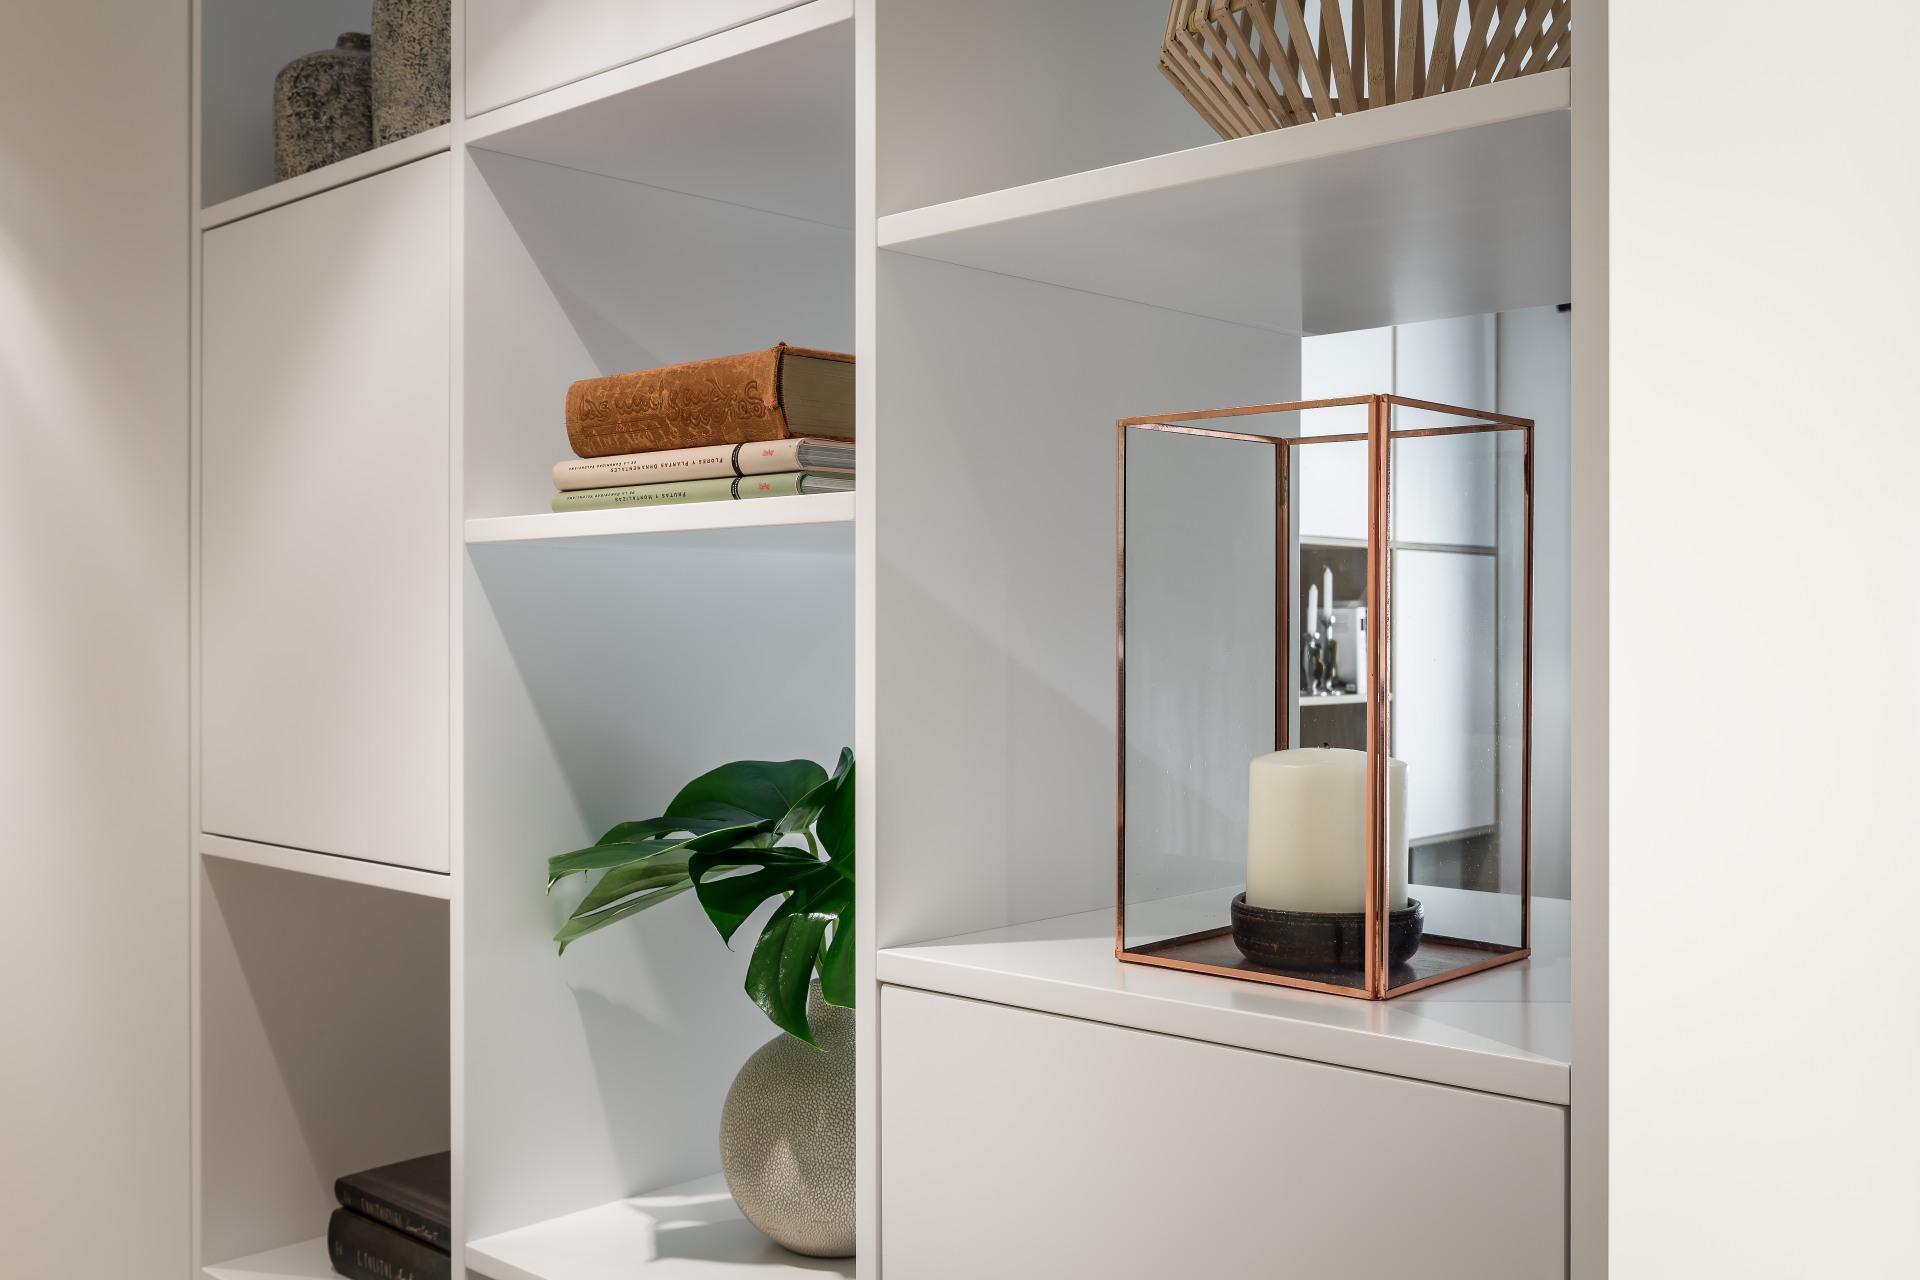 fotografia-arquitectura-interiorismo-valencia-german-cabo-laura-yerpes-mandas (3)